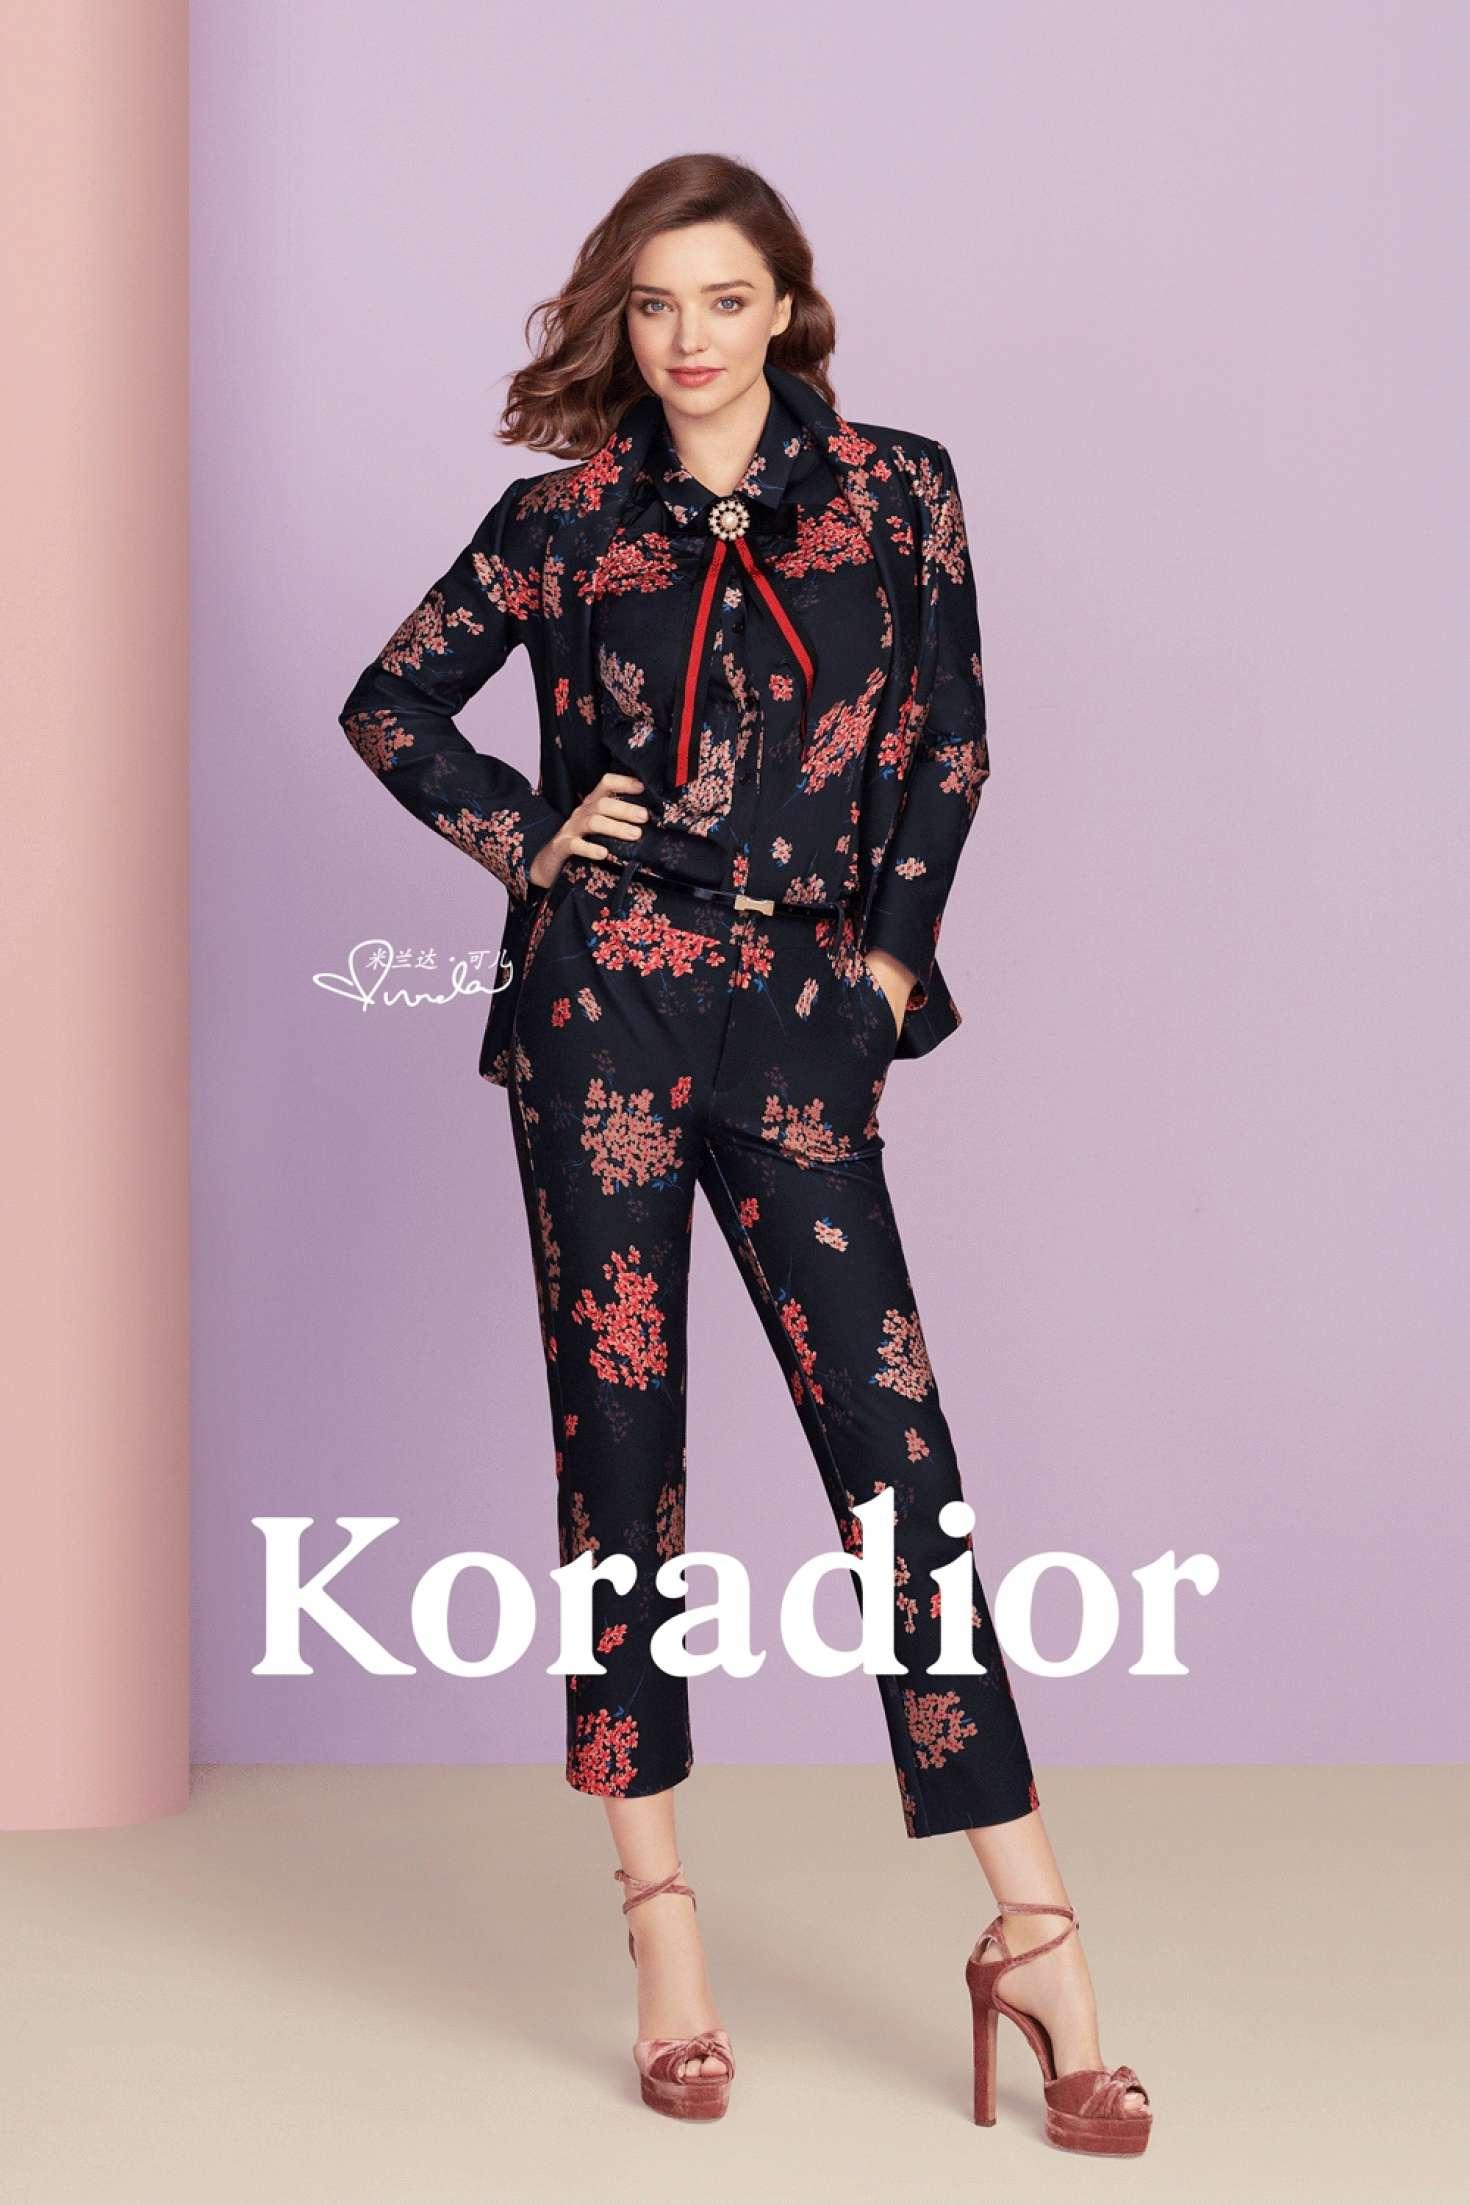 Miranda Kerr 2017 : Miranda Kerr: Koradior Spring 2018 Campaign -05